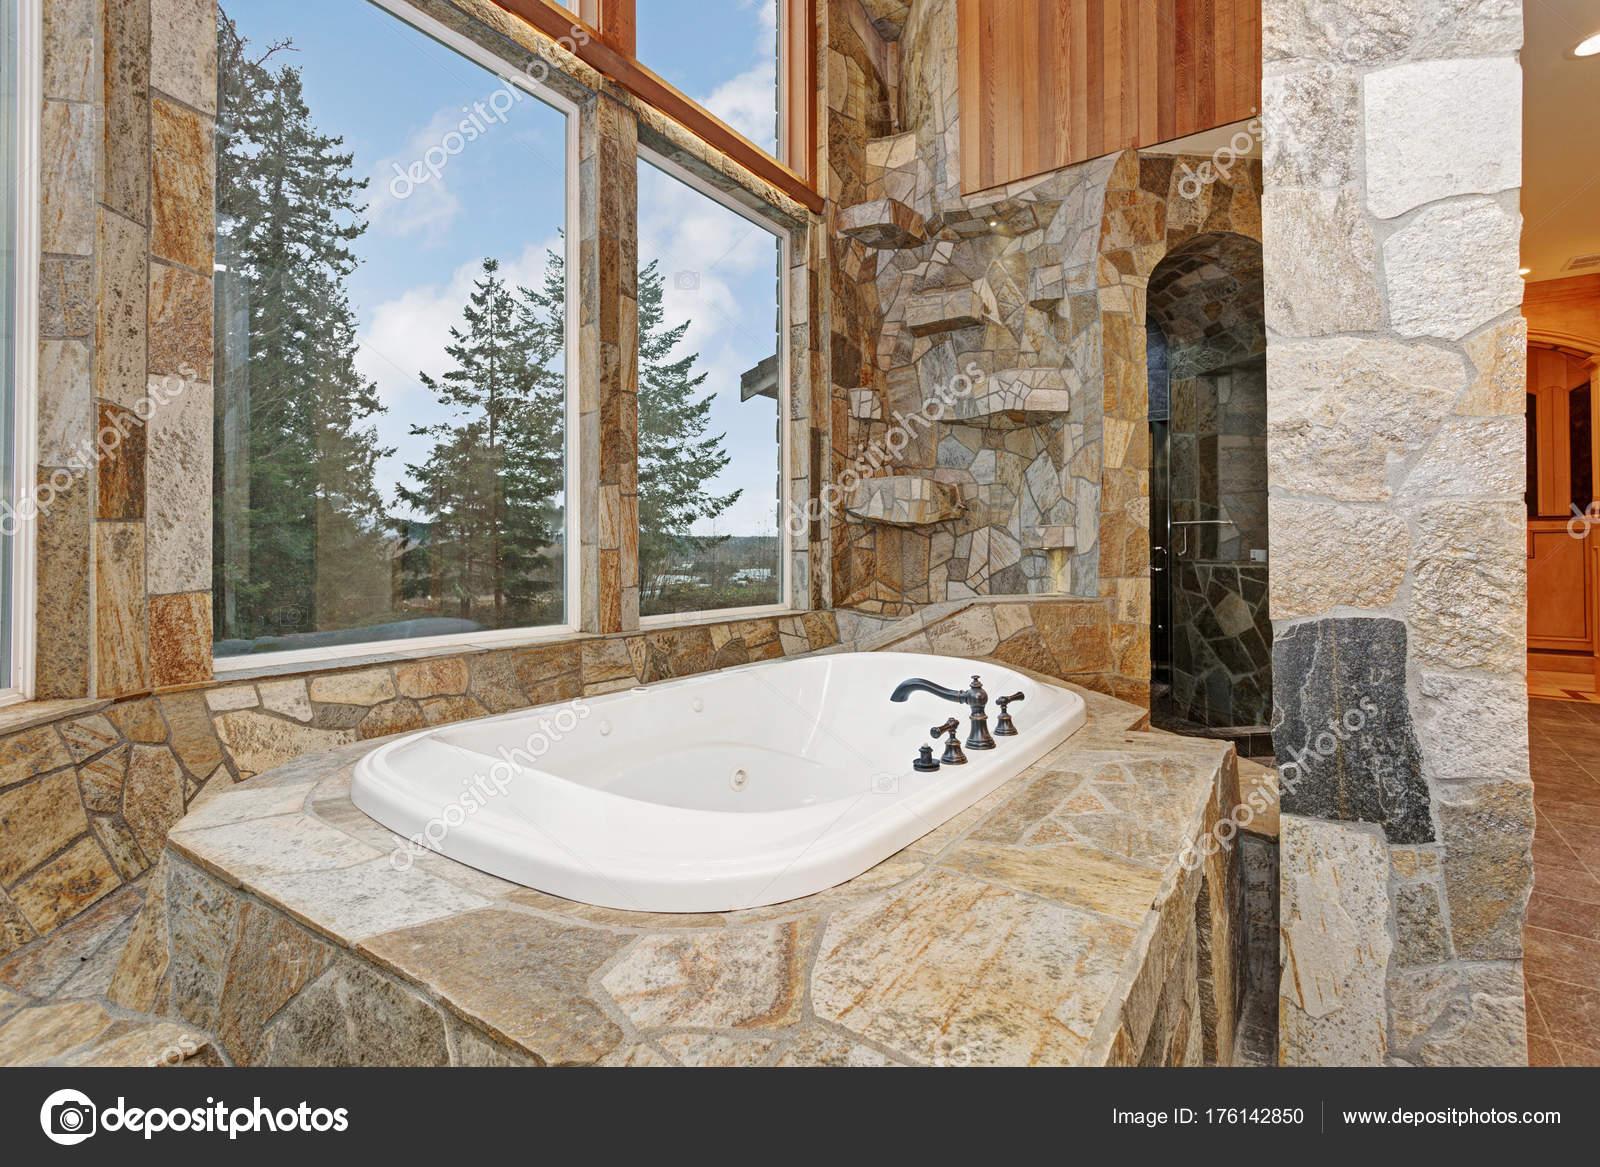 Elegant lussuosa dropin vasca da bagno rivestito in - Vasca da bagno in pietra ...